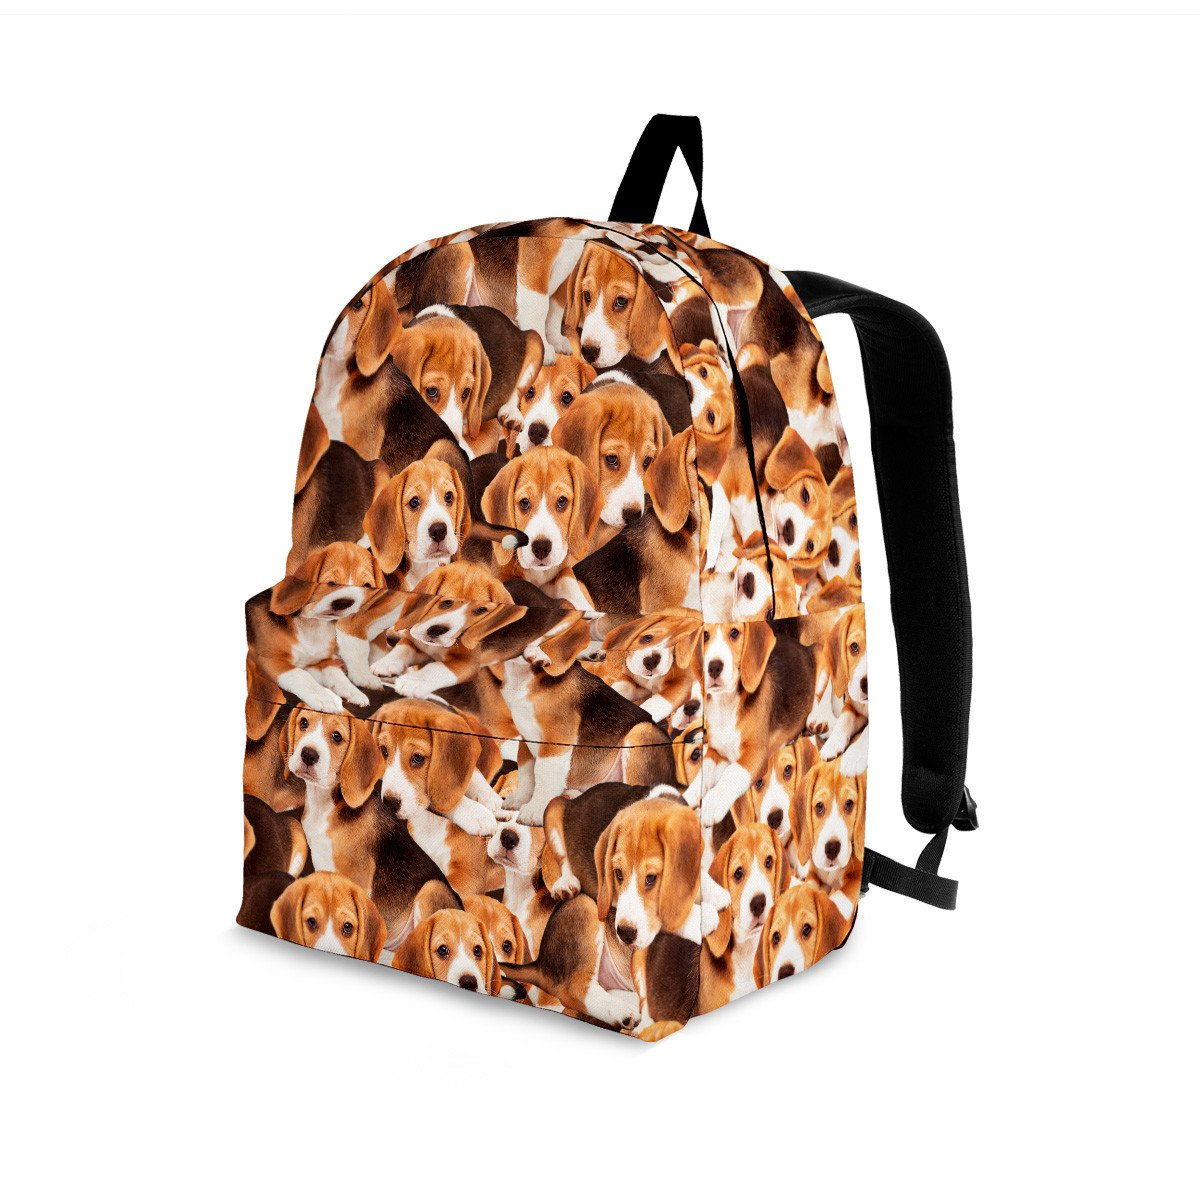 Beagles Backpack USD 44.95 https://t.co/K7kCQxZASs https://t.co/mZijXZOt2a